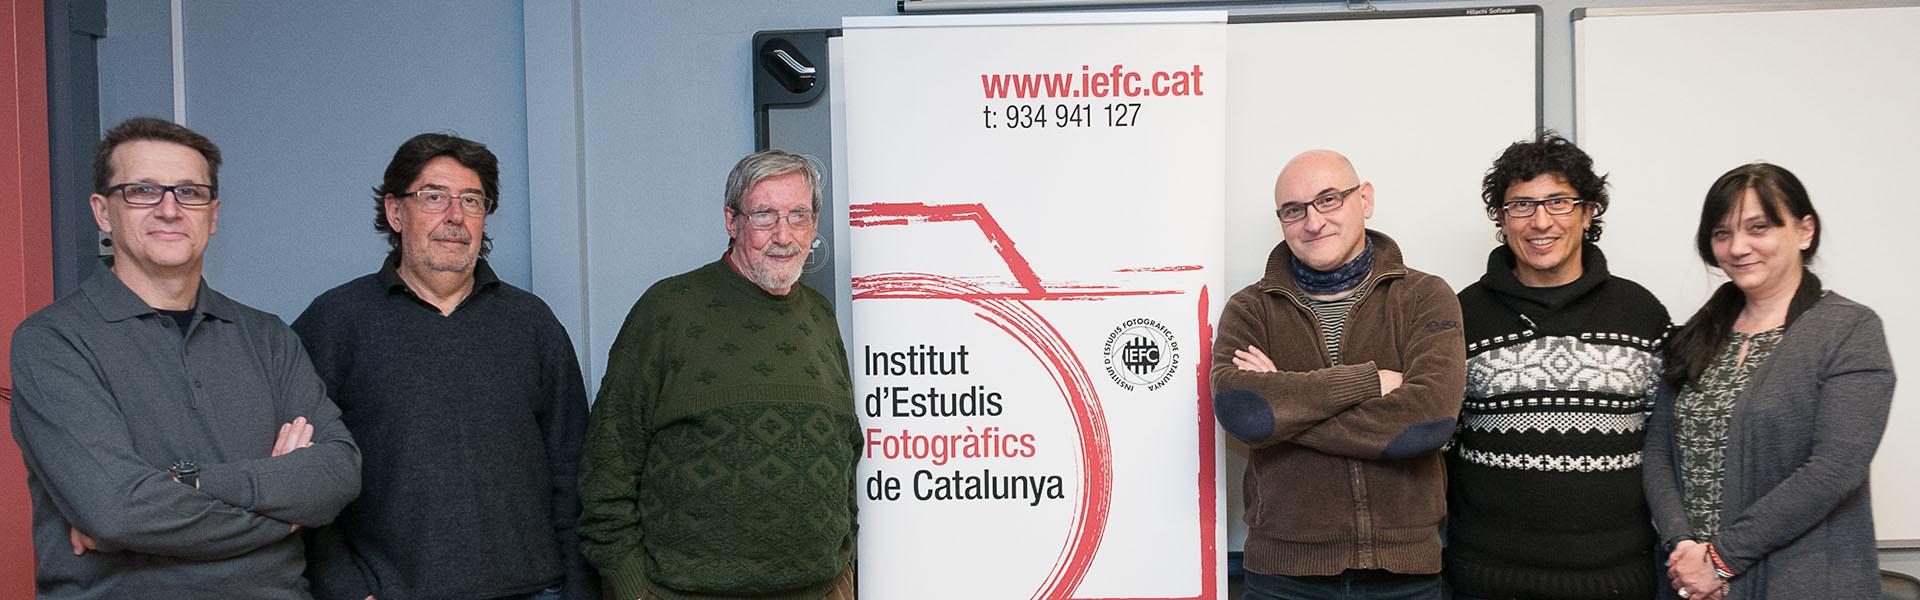 Signatura conveni AFP-IEFC. Foto: Juan Ruz Jiménez